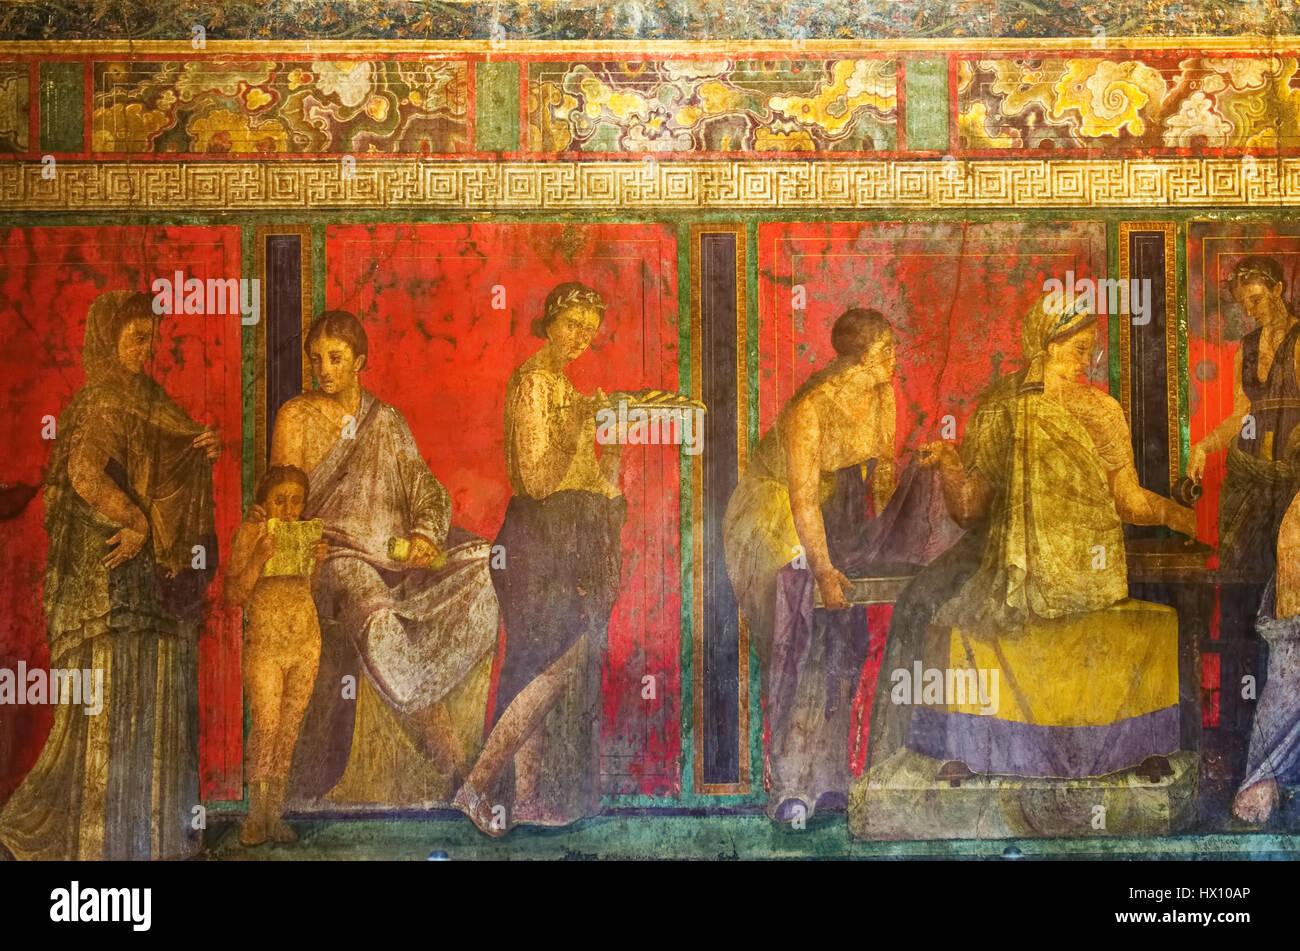 Fresco from Pompeii's Villa of Mysteries. - Stock Image